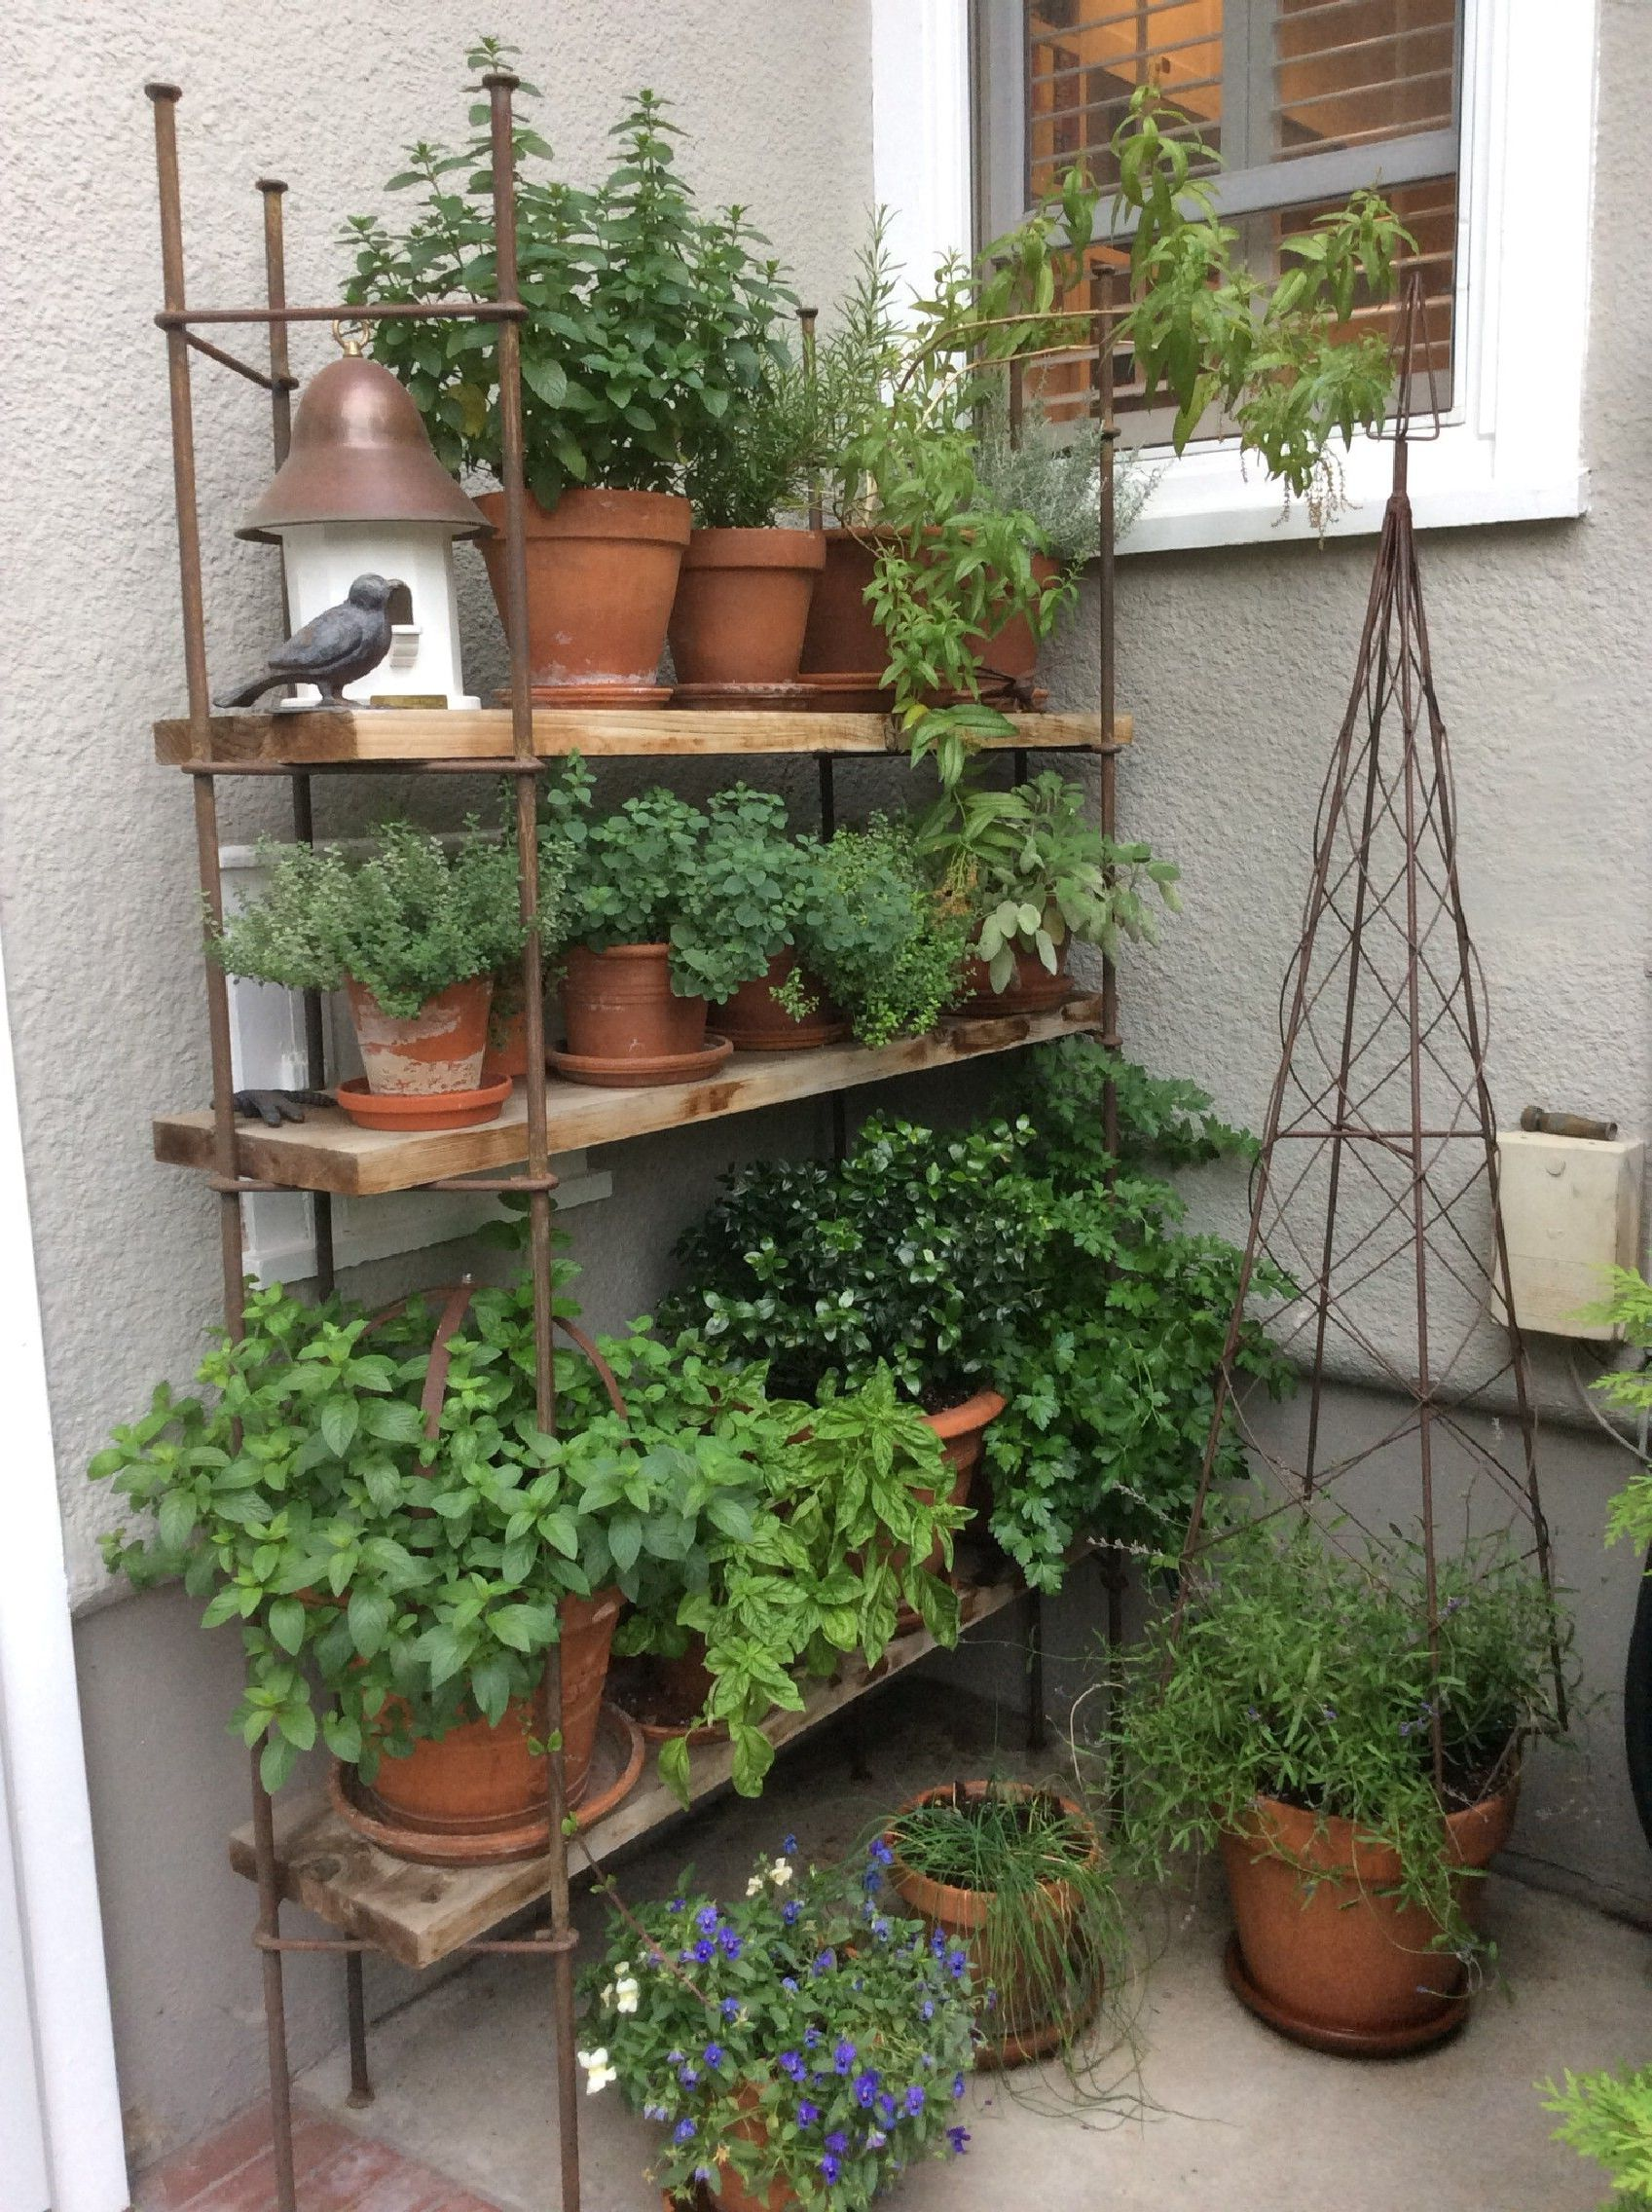 10 Patio Herb Garden Ideas Most Brilliant And Attractive Small